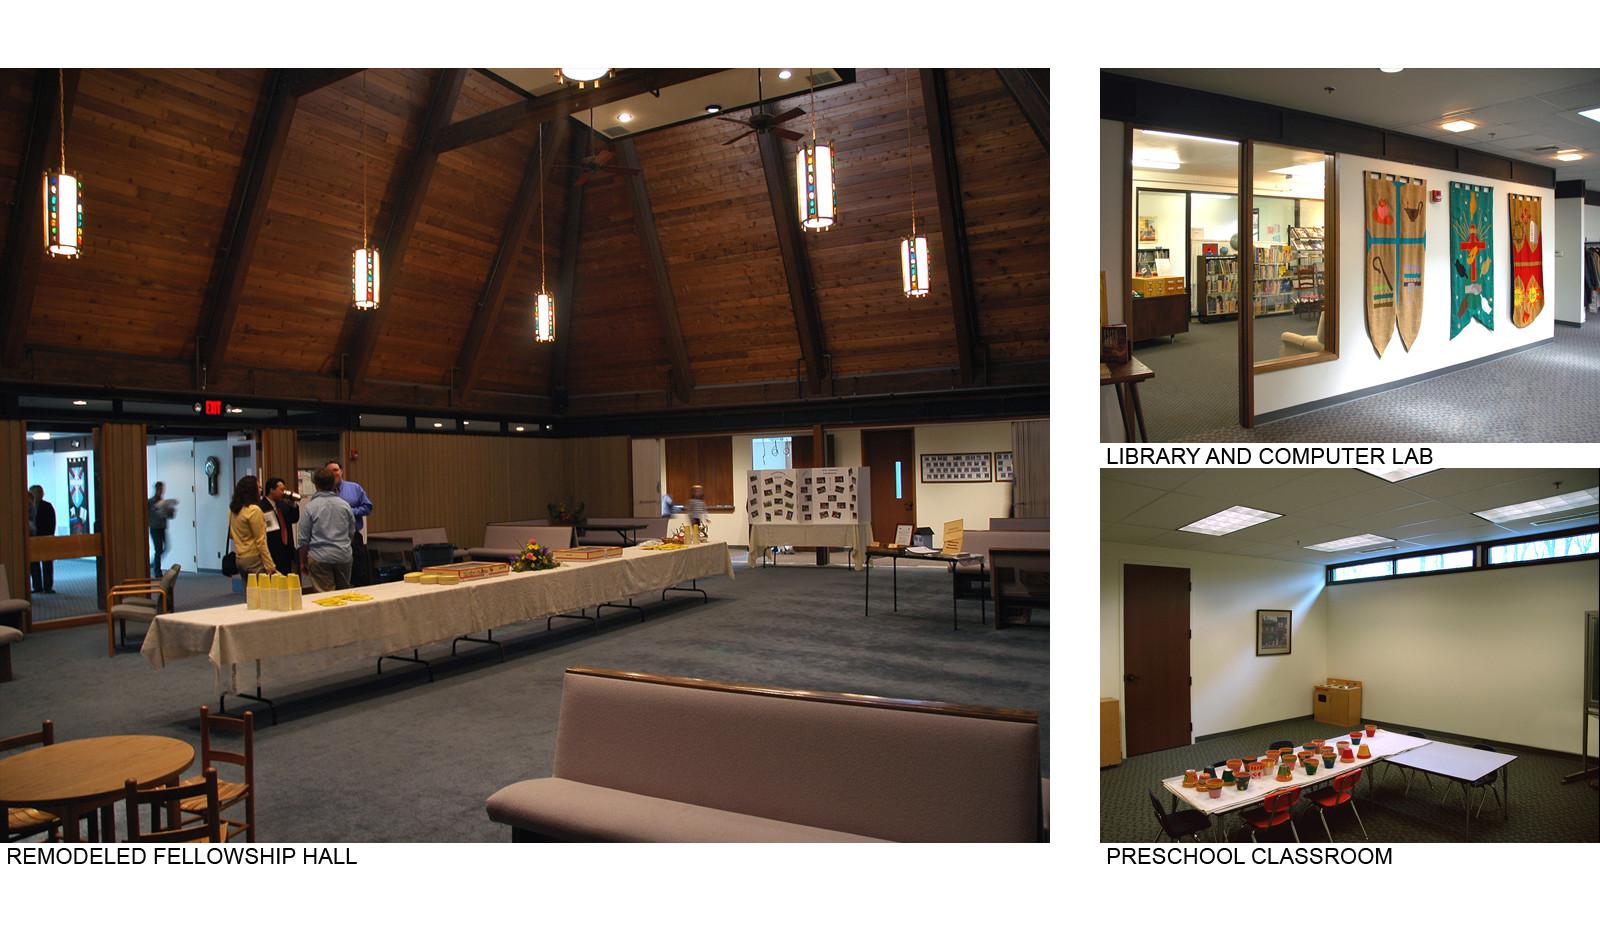 Fellowship Hall, Library & Classroom